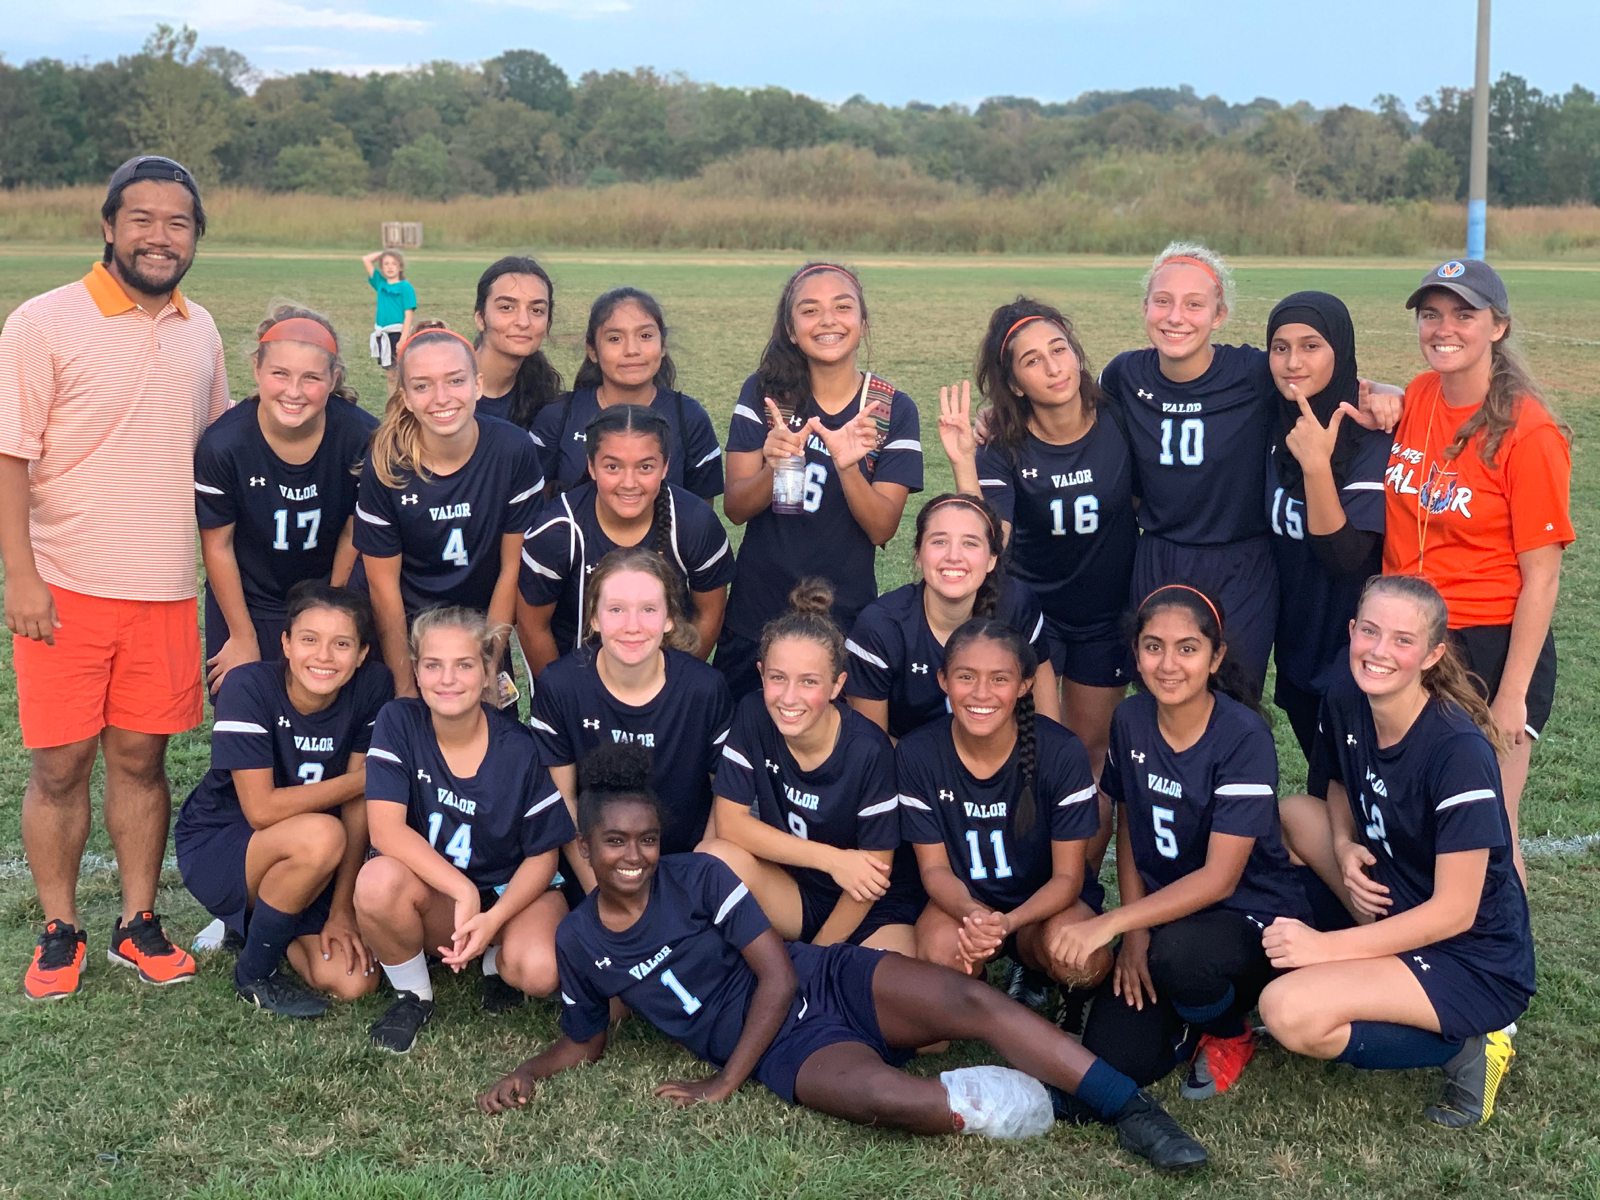 High School Girls Soccer wins Orange Out Game 9-0 over KIPP